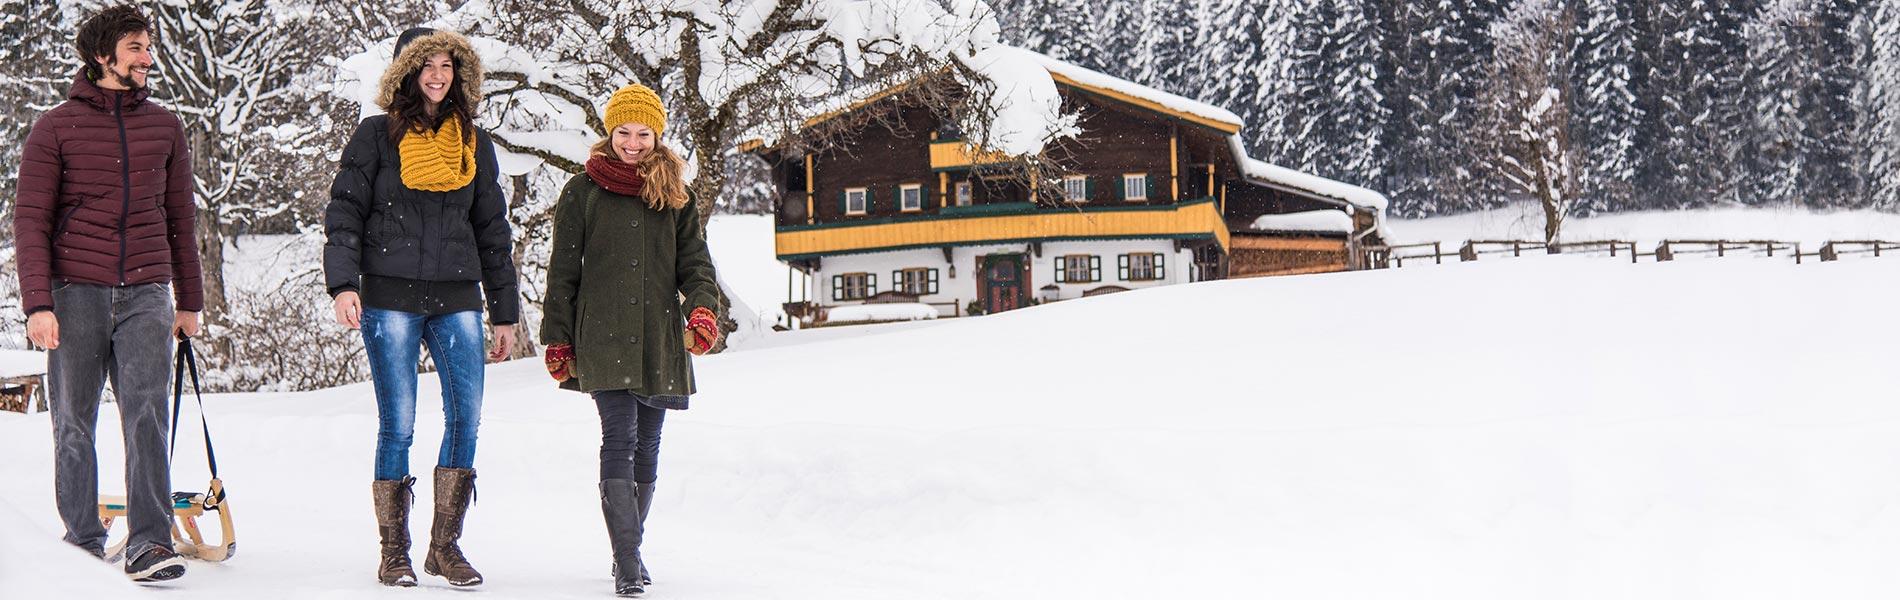 Rodeln Biathlon Eisklettern Hotel Rosengarten 5 Sterne Hotel Relais & Châteaux Hotel Kirchberg Tirol Austria